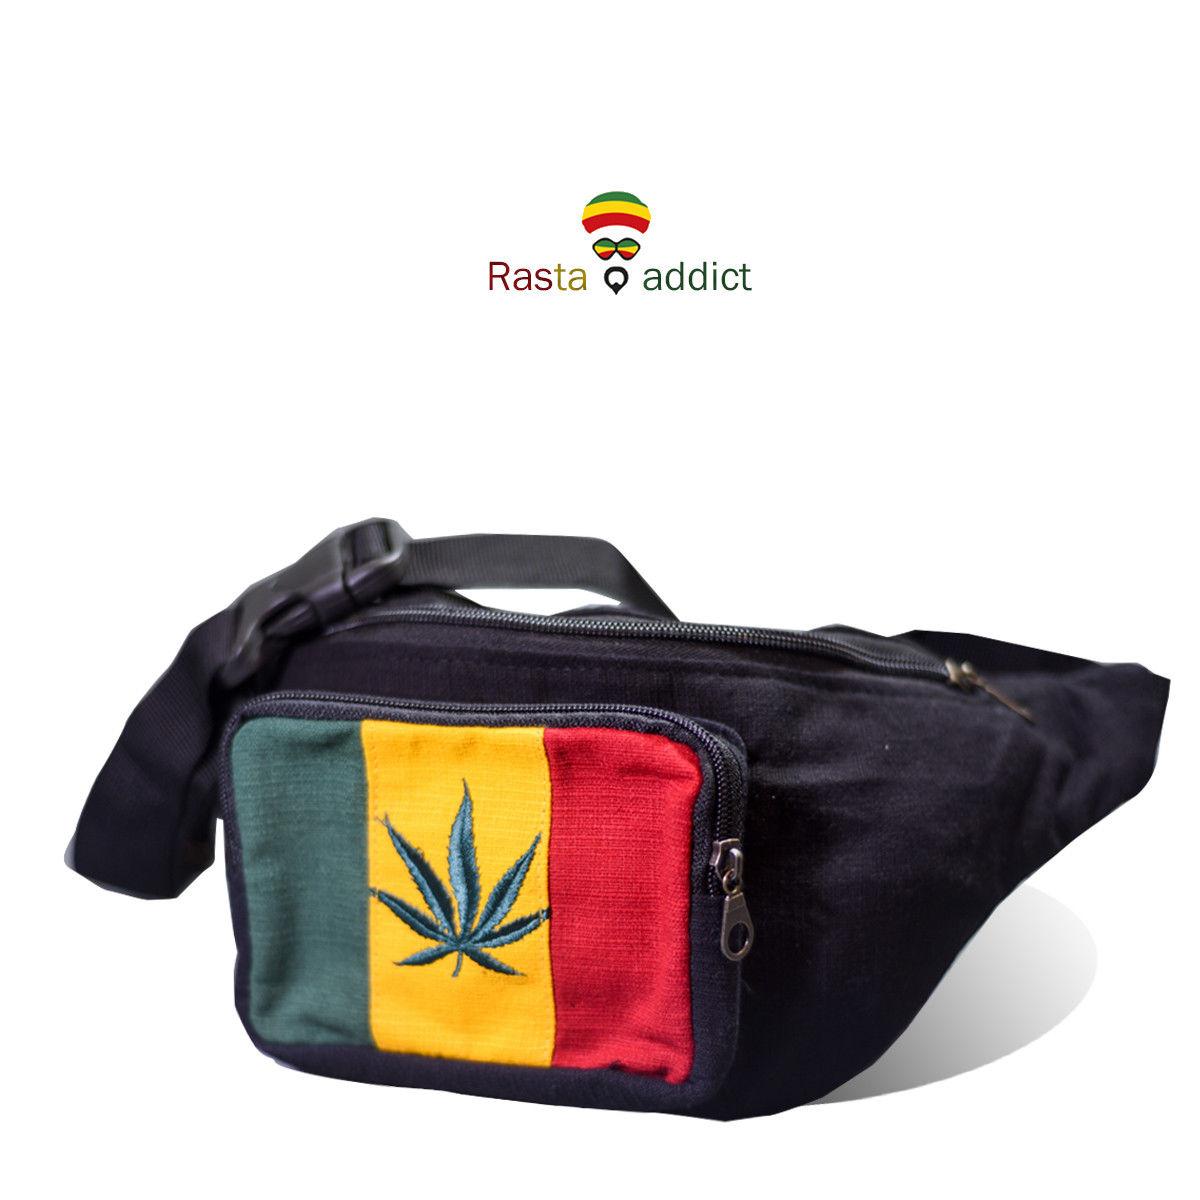 Rasta Marijuana S . Waist Bag Reggae Jamica Fanny Pack Bag Adjustable Belt 1